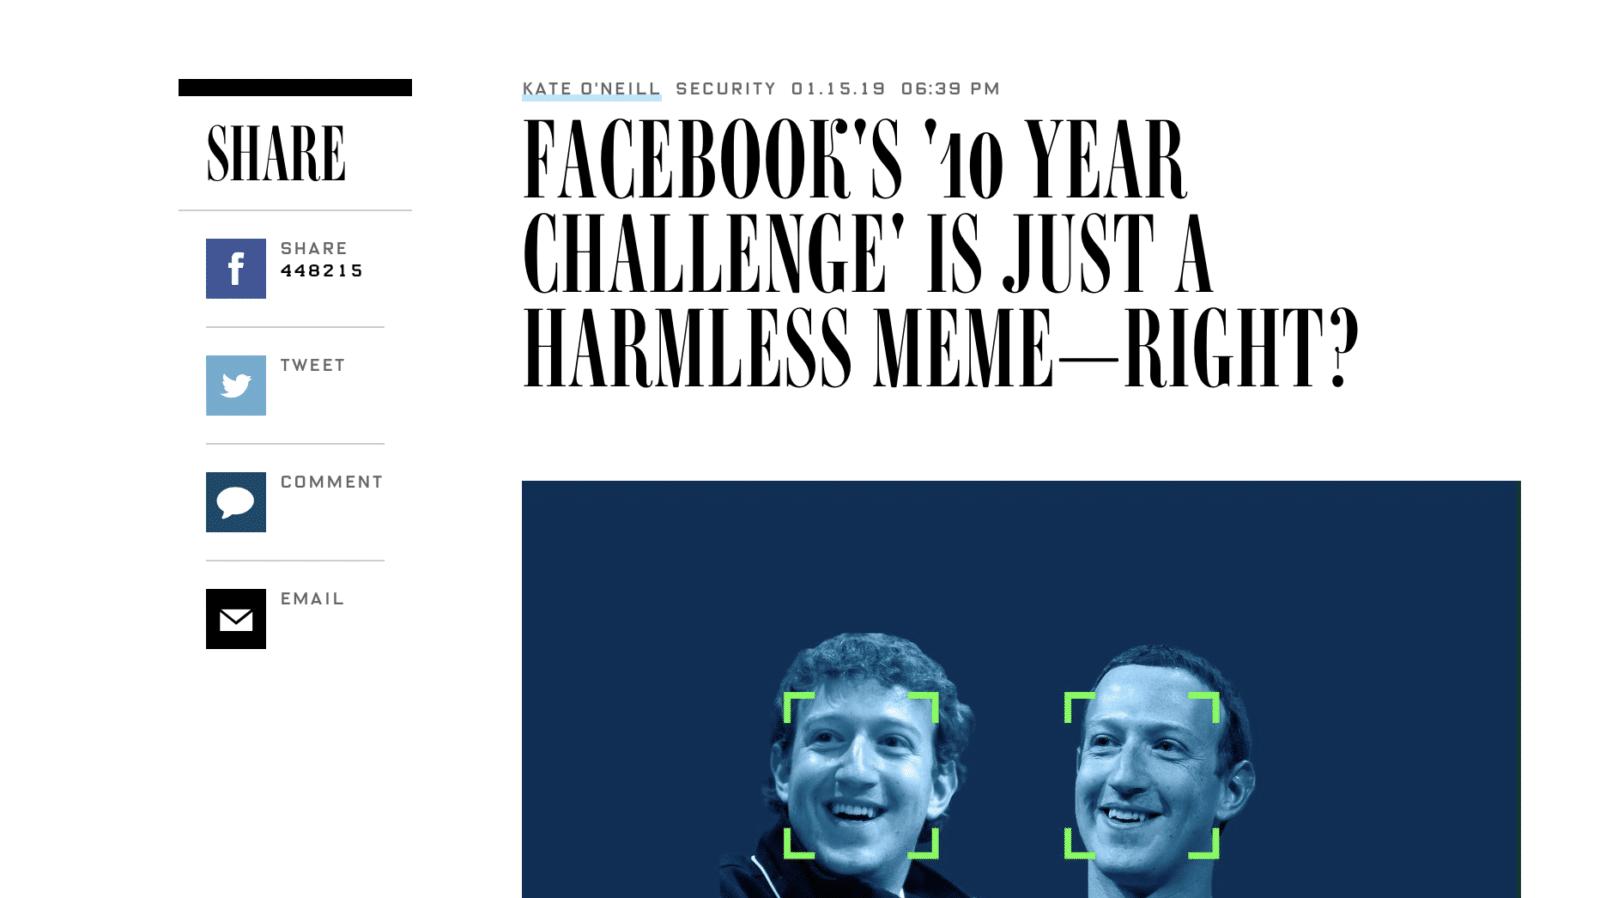 Facebook โดนตั้งข้อสังเกตอาจอยู่เบื้องหลัง 10 Years Challenge เพื่อเทรน AI